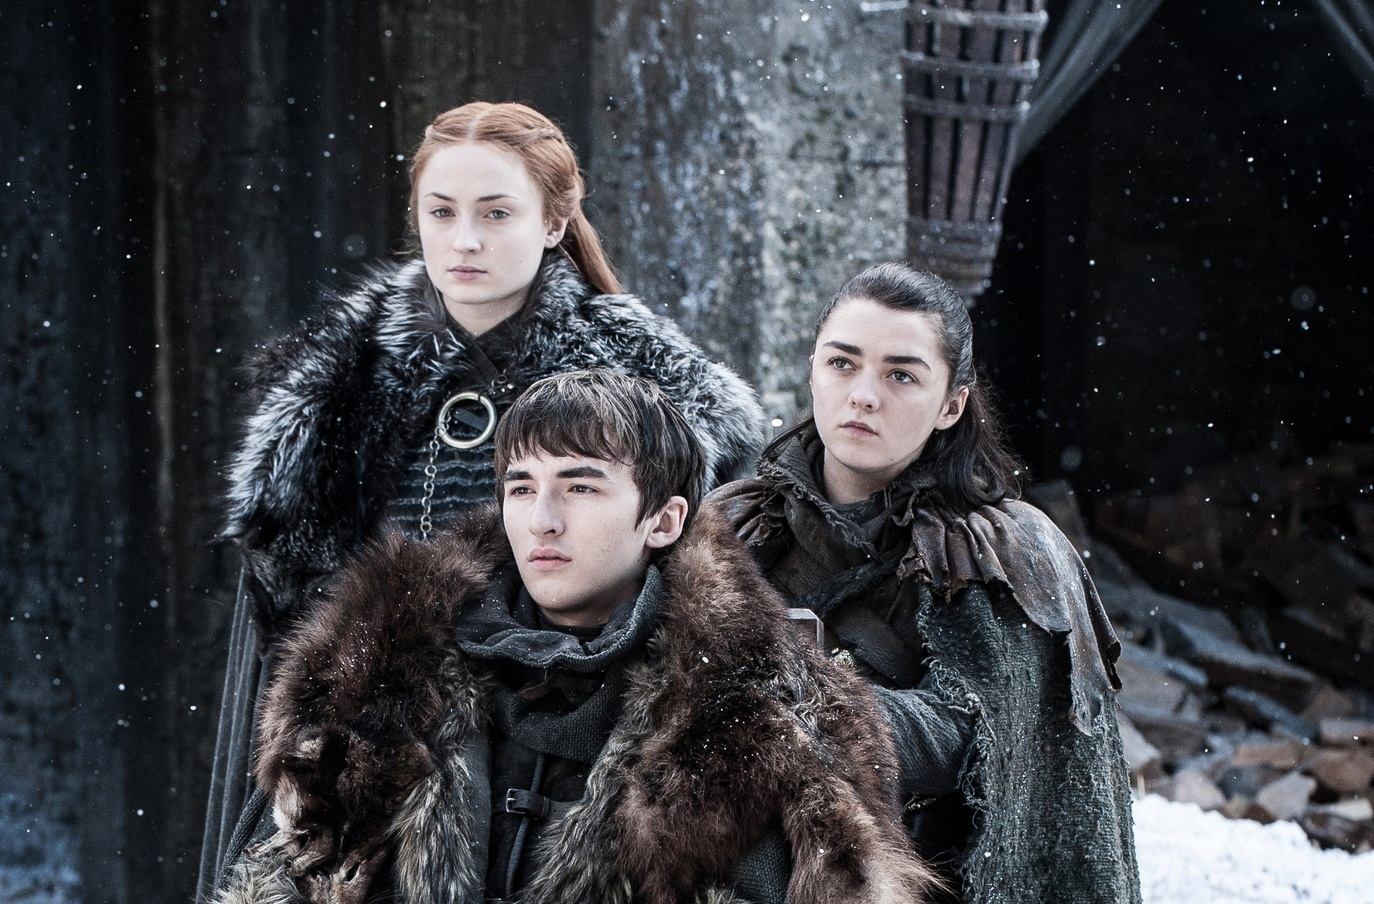 Sansa-Arya-and-Bran-reunited-The-Spoils-of-War